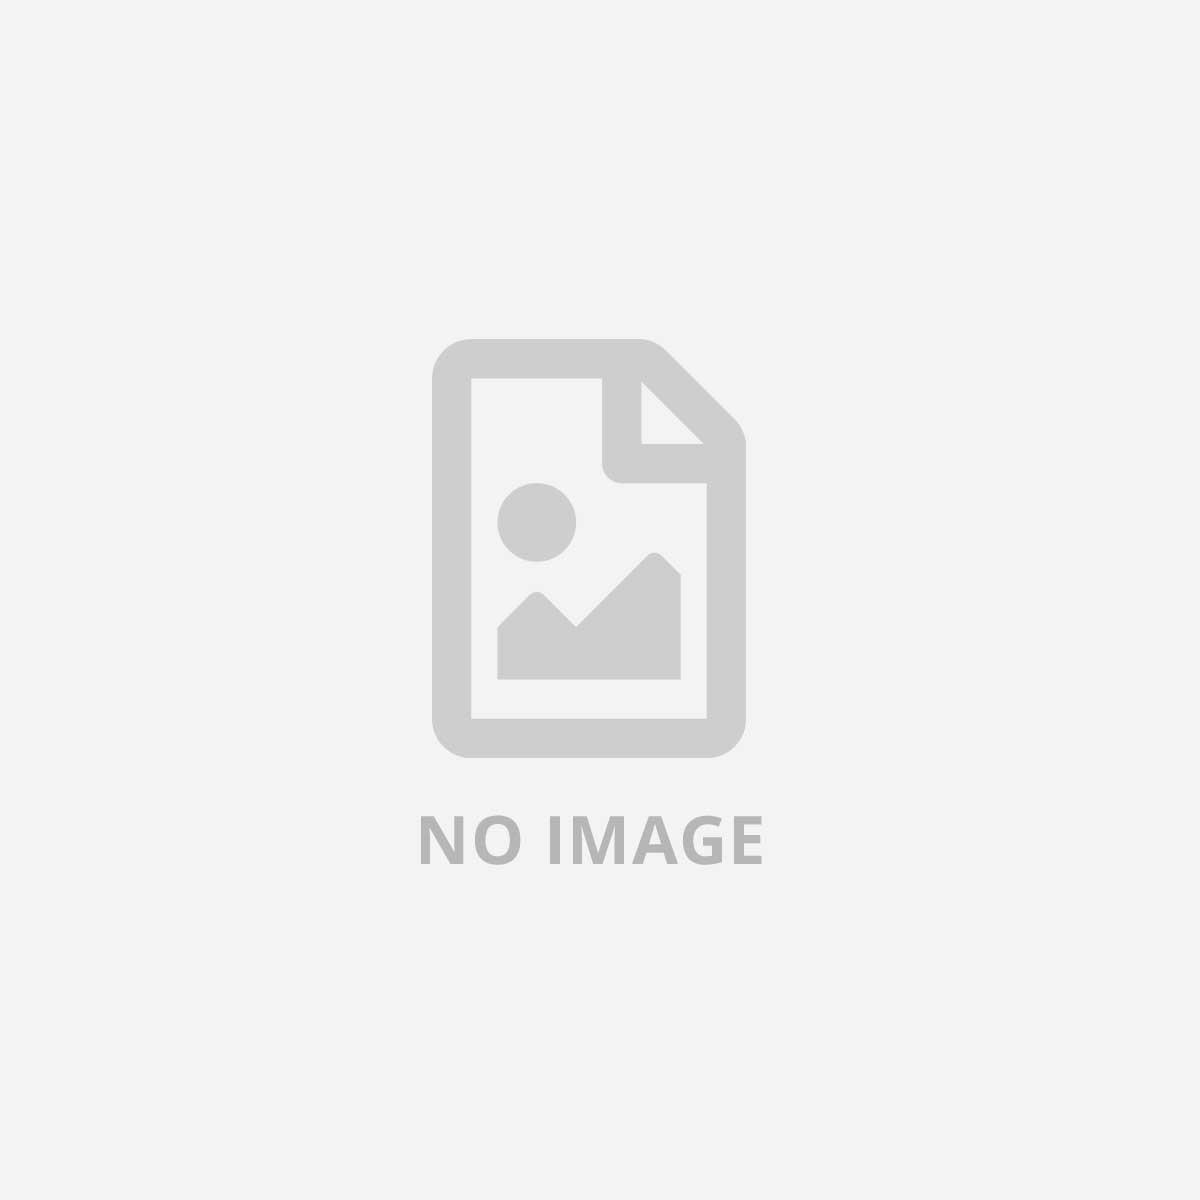 MEDION RADIO DAB CON DISPLAY